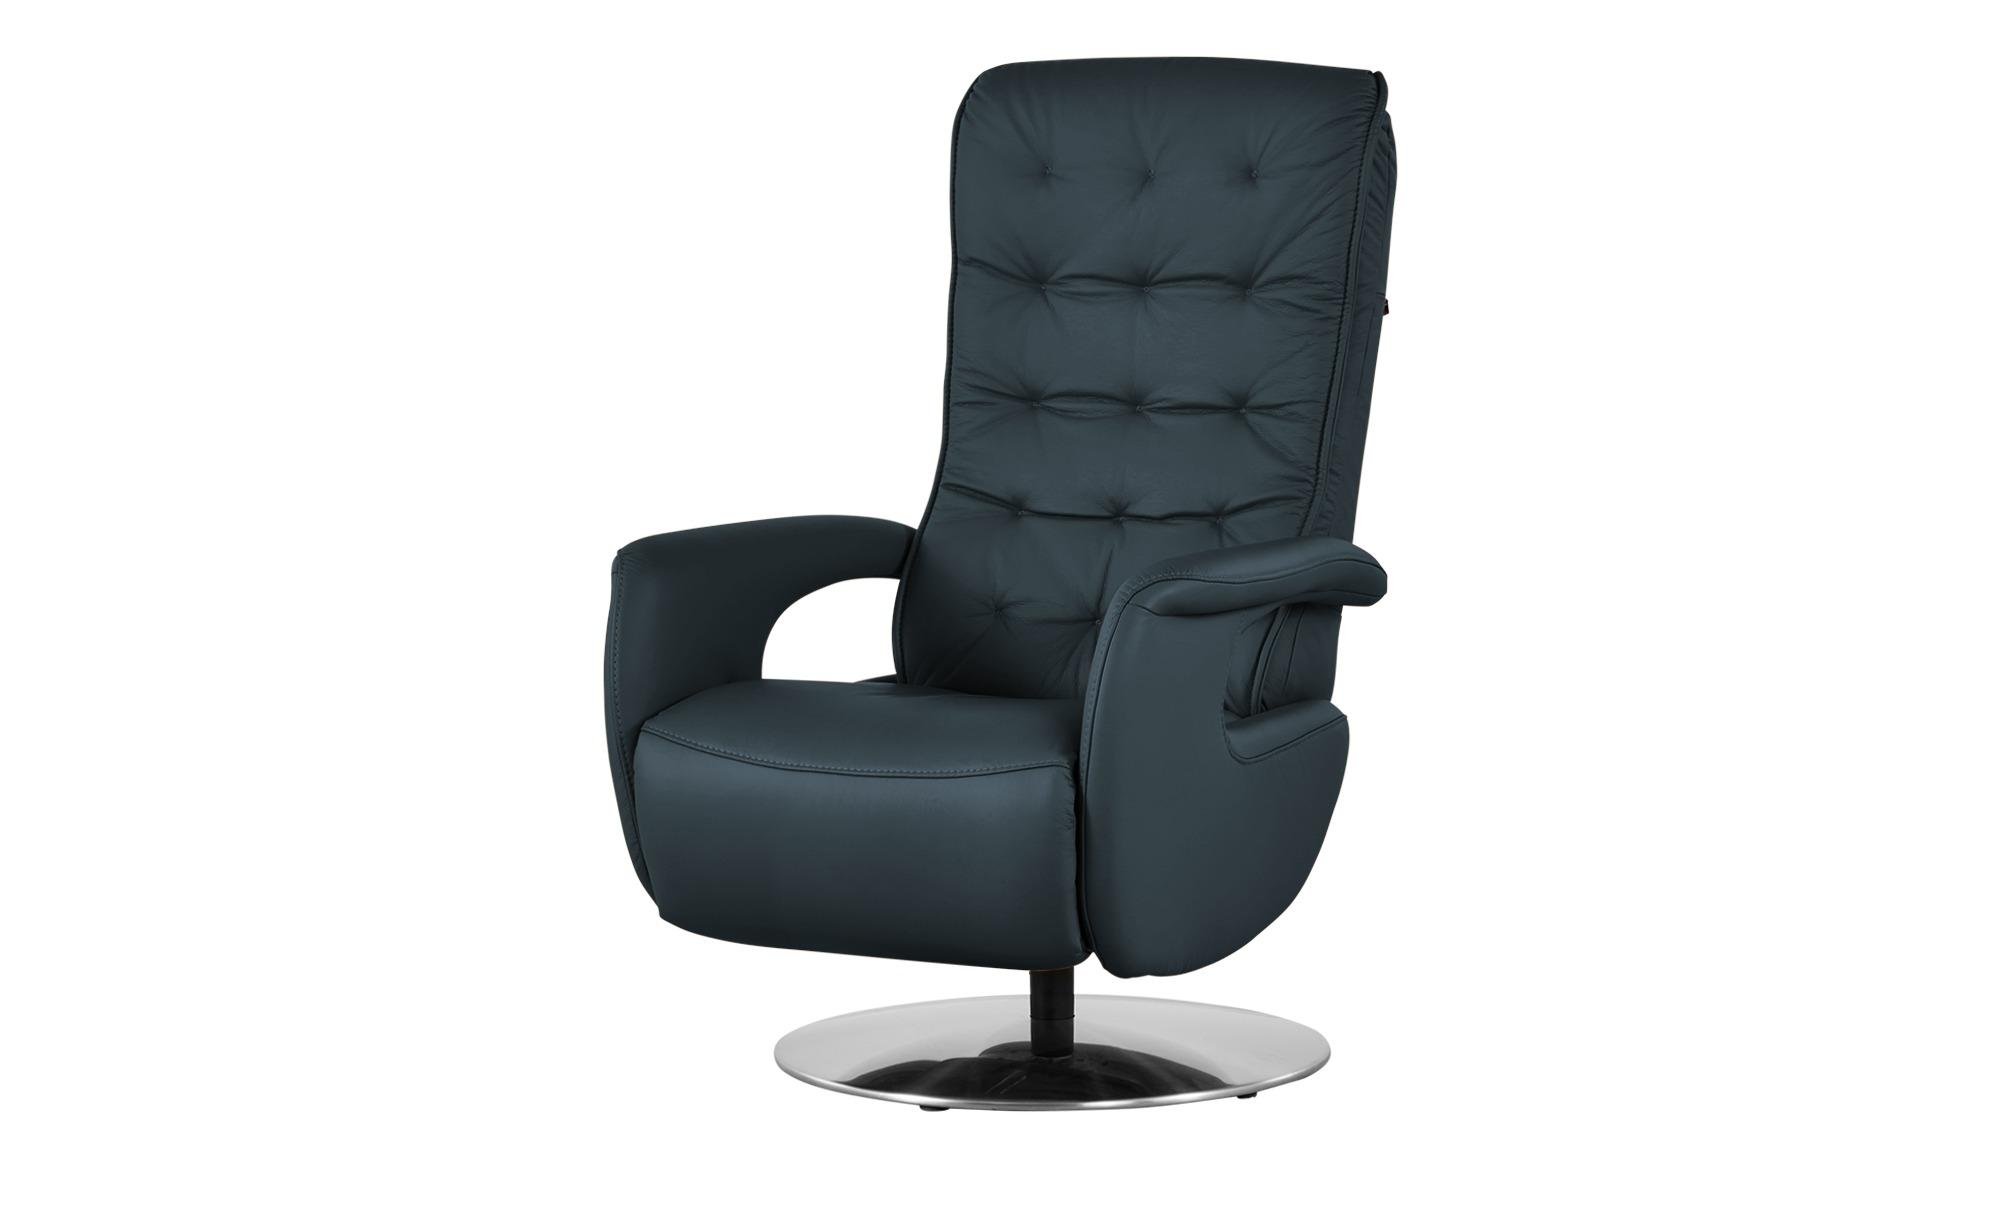 Hukla Relaxsessel  Smilla ¦ blau ¦ Maße (cm): B: 72 H: 113 T: 83 Polstermöbel > Sessel > Ledersessel - Höffner